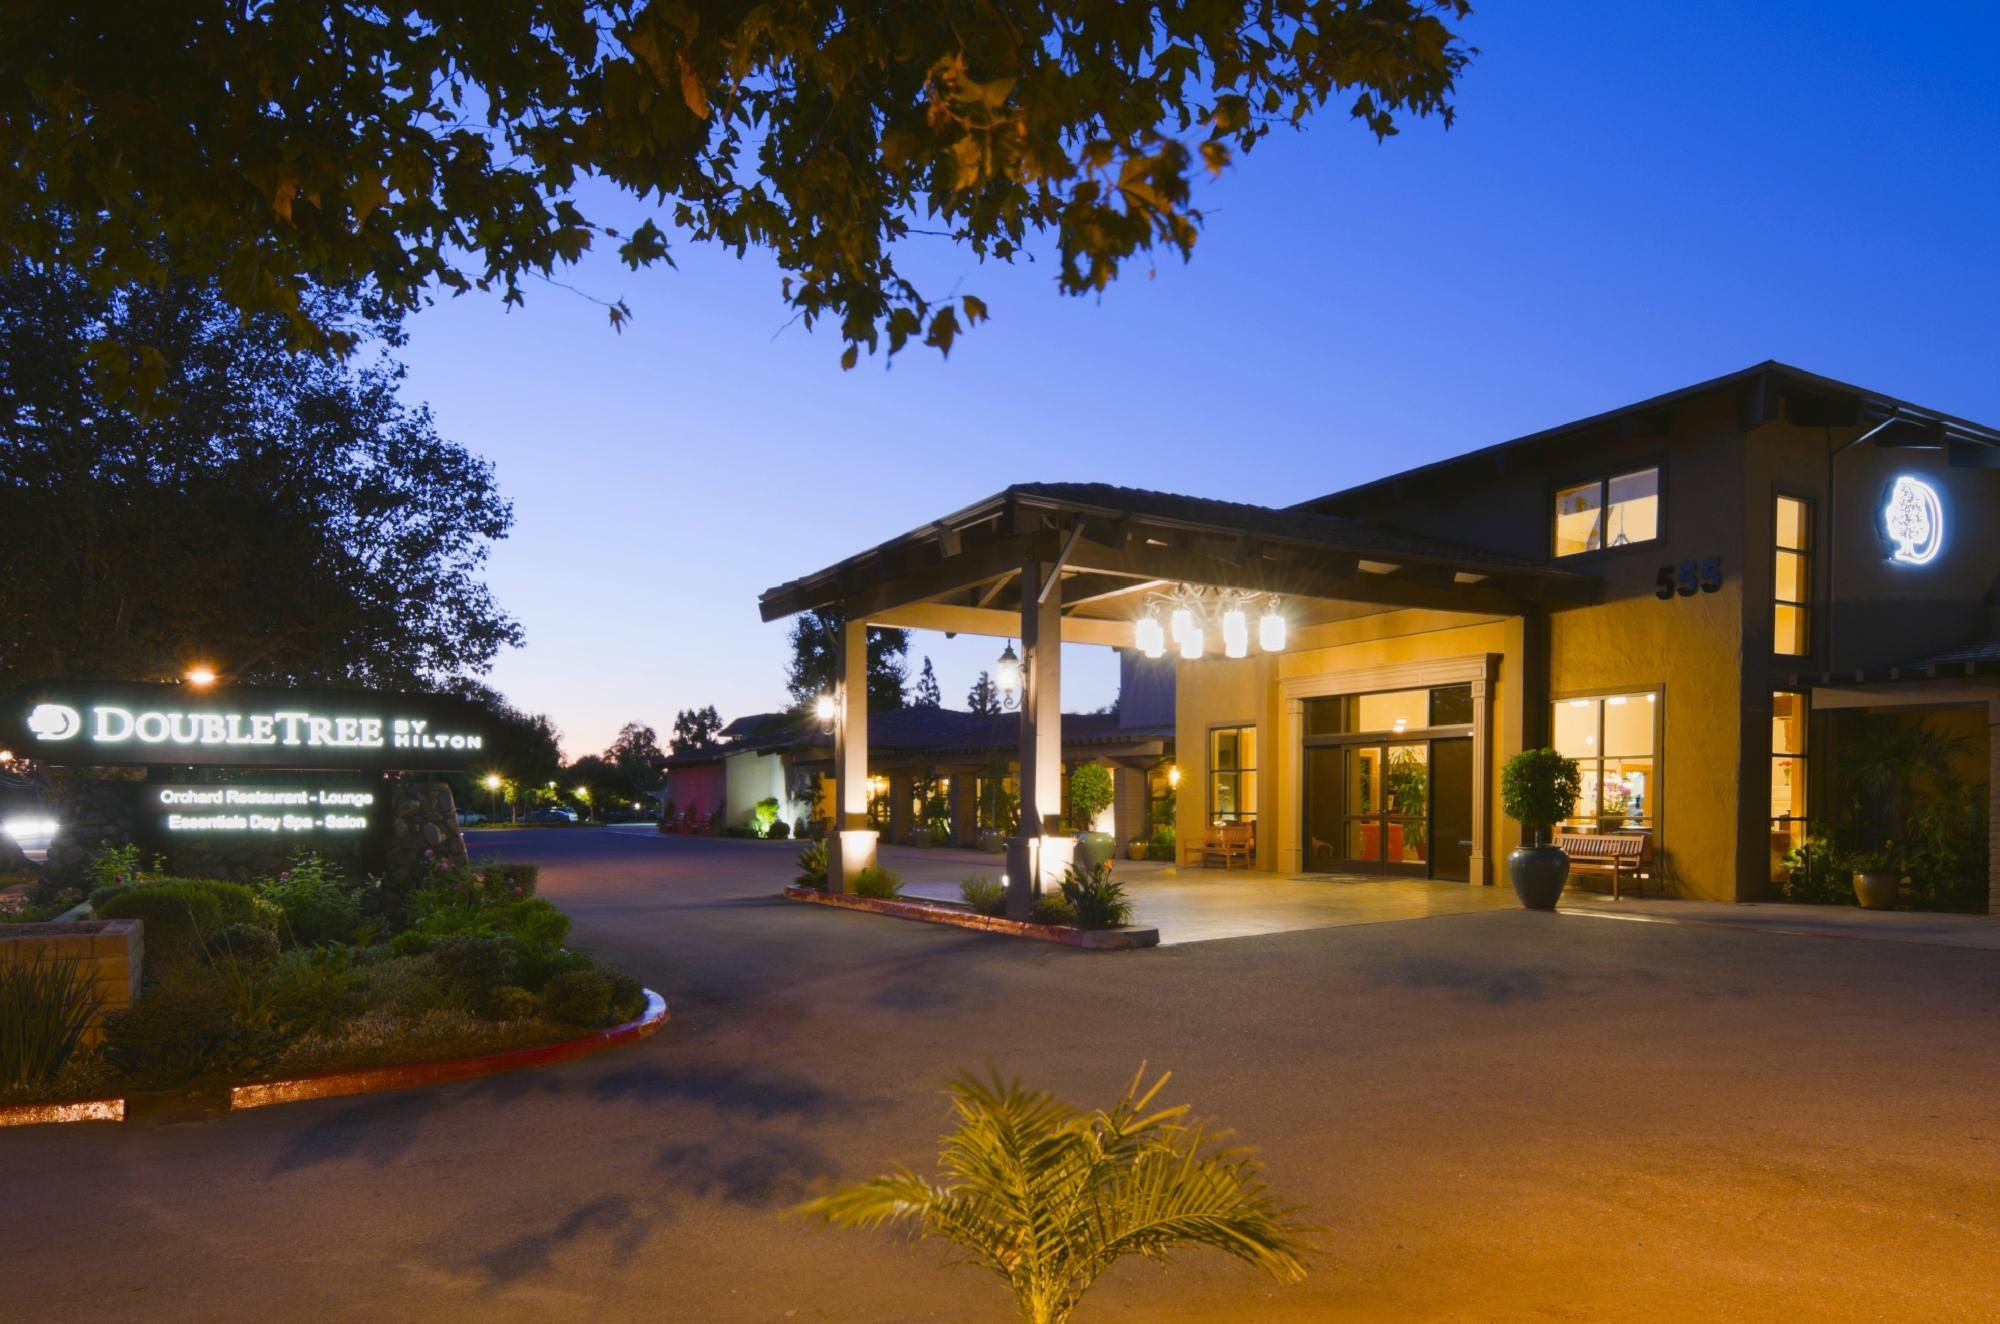 Doubletree Hotel Claremont